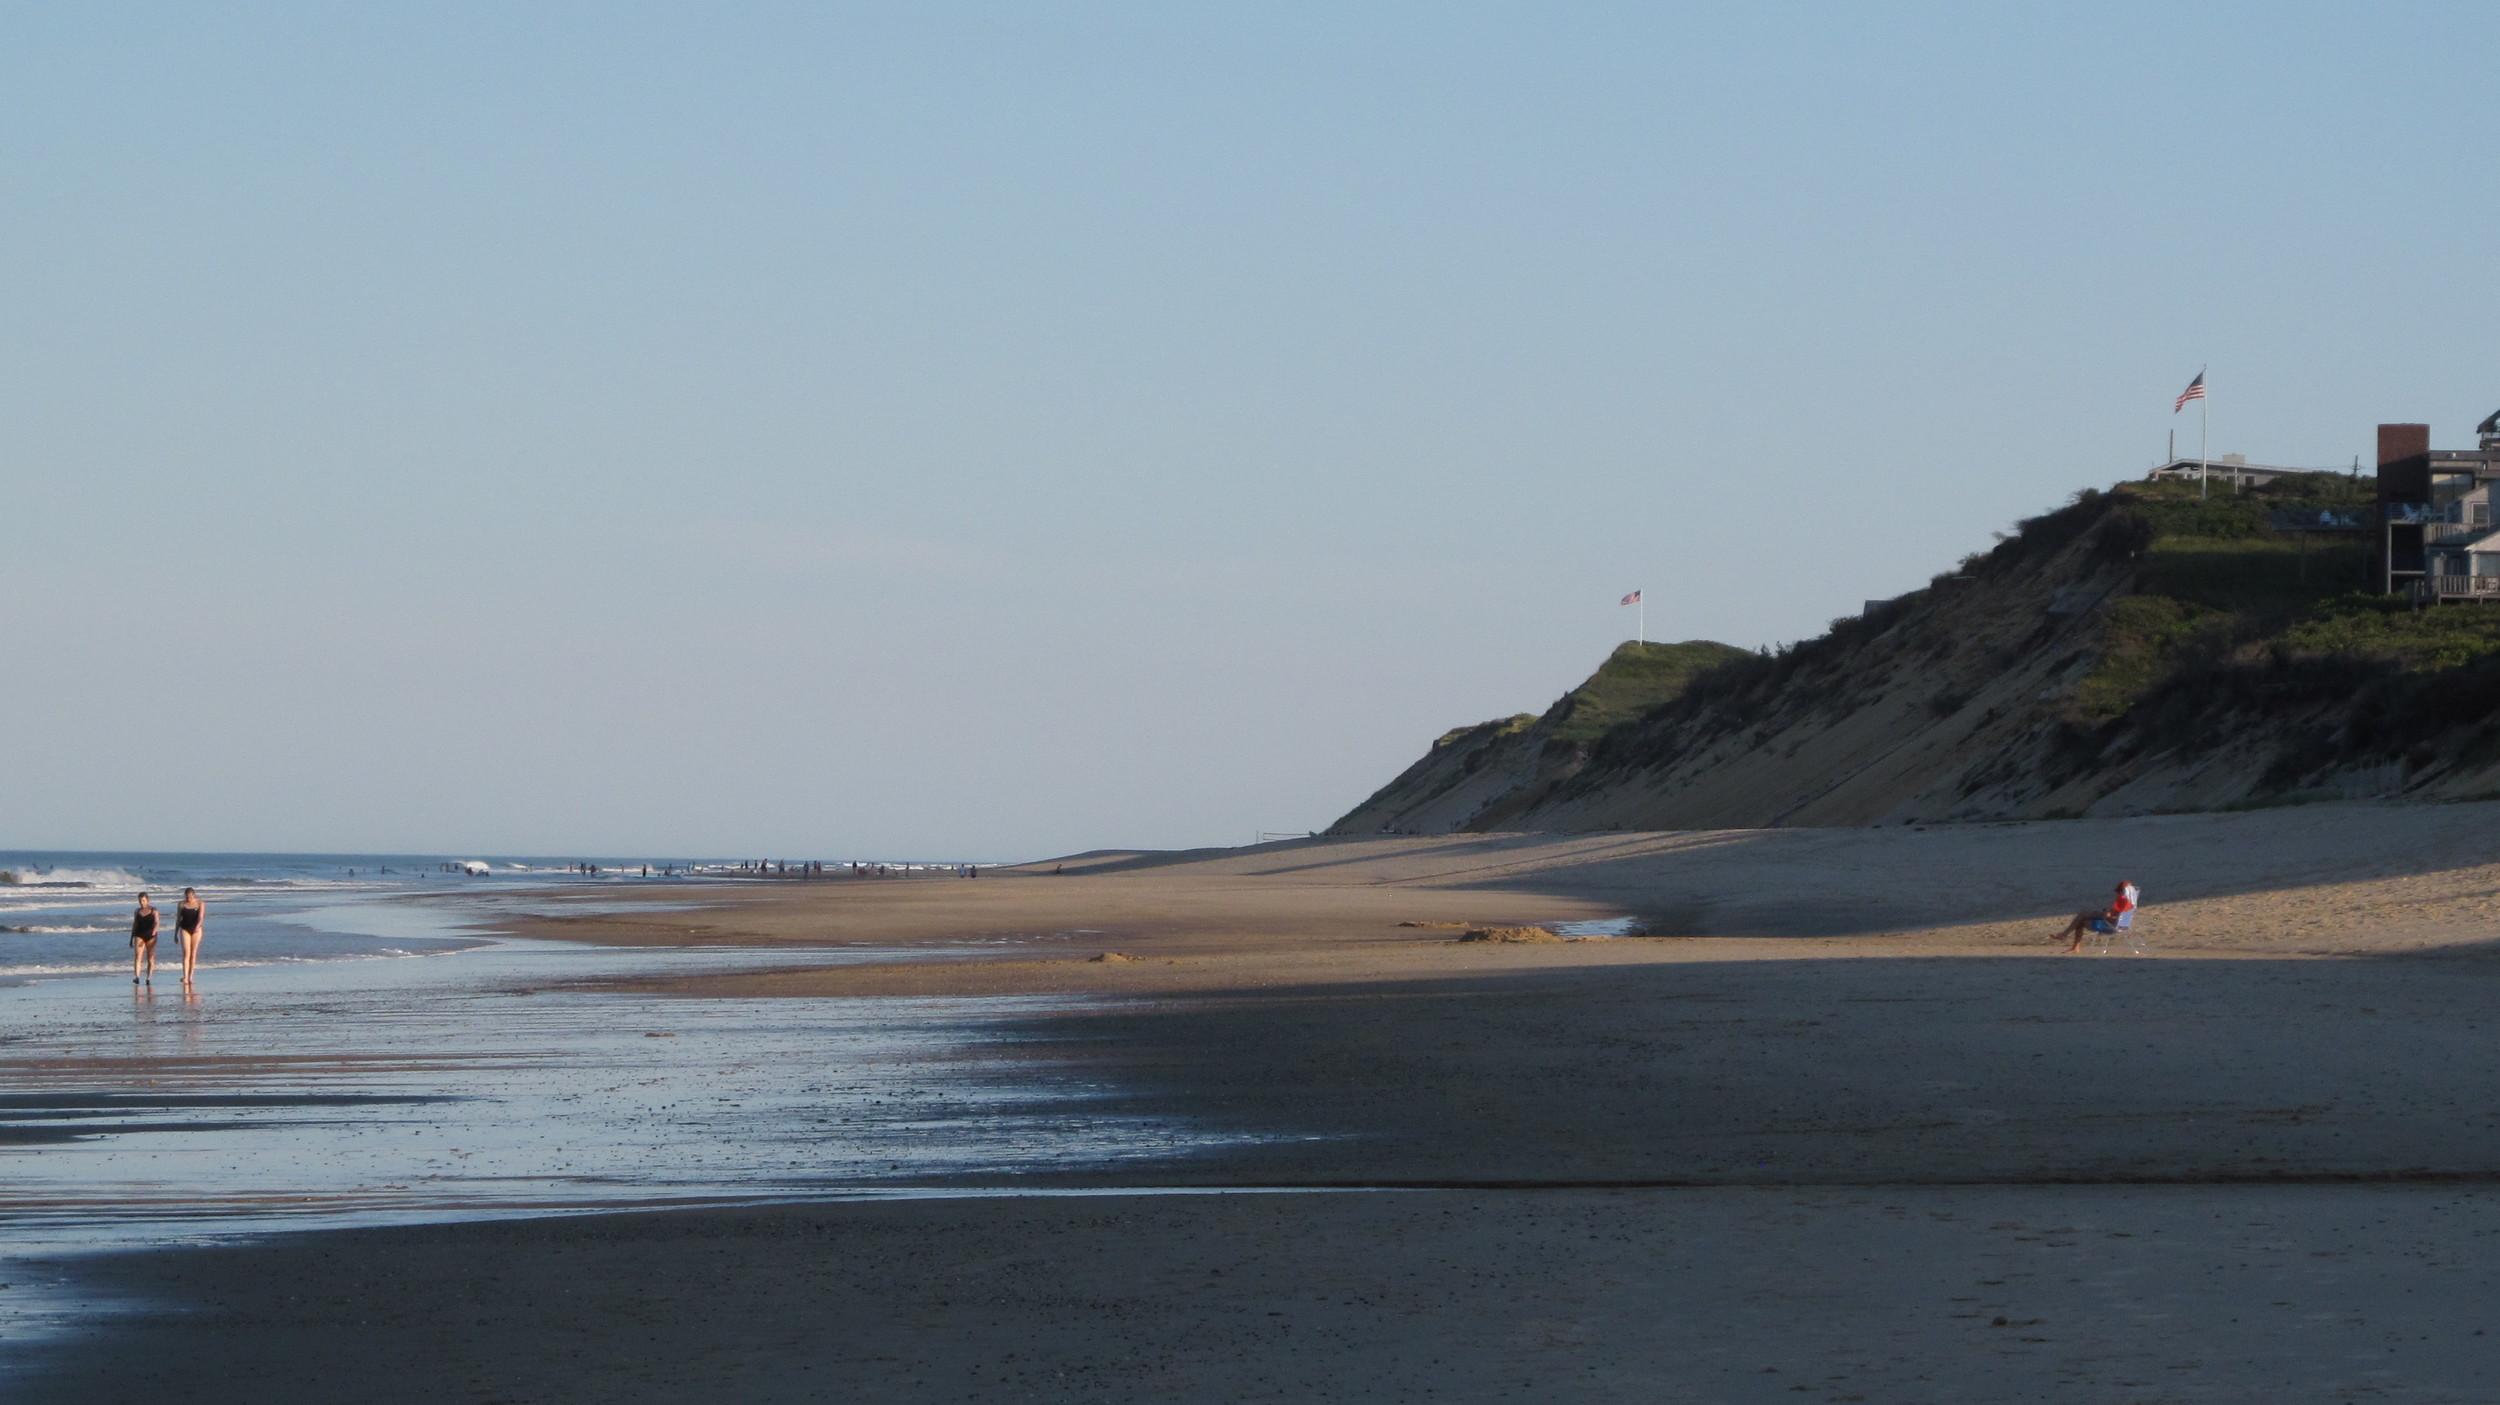 White Crest Beach, Wellfleet